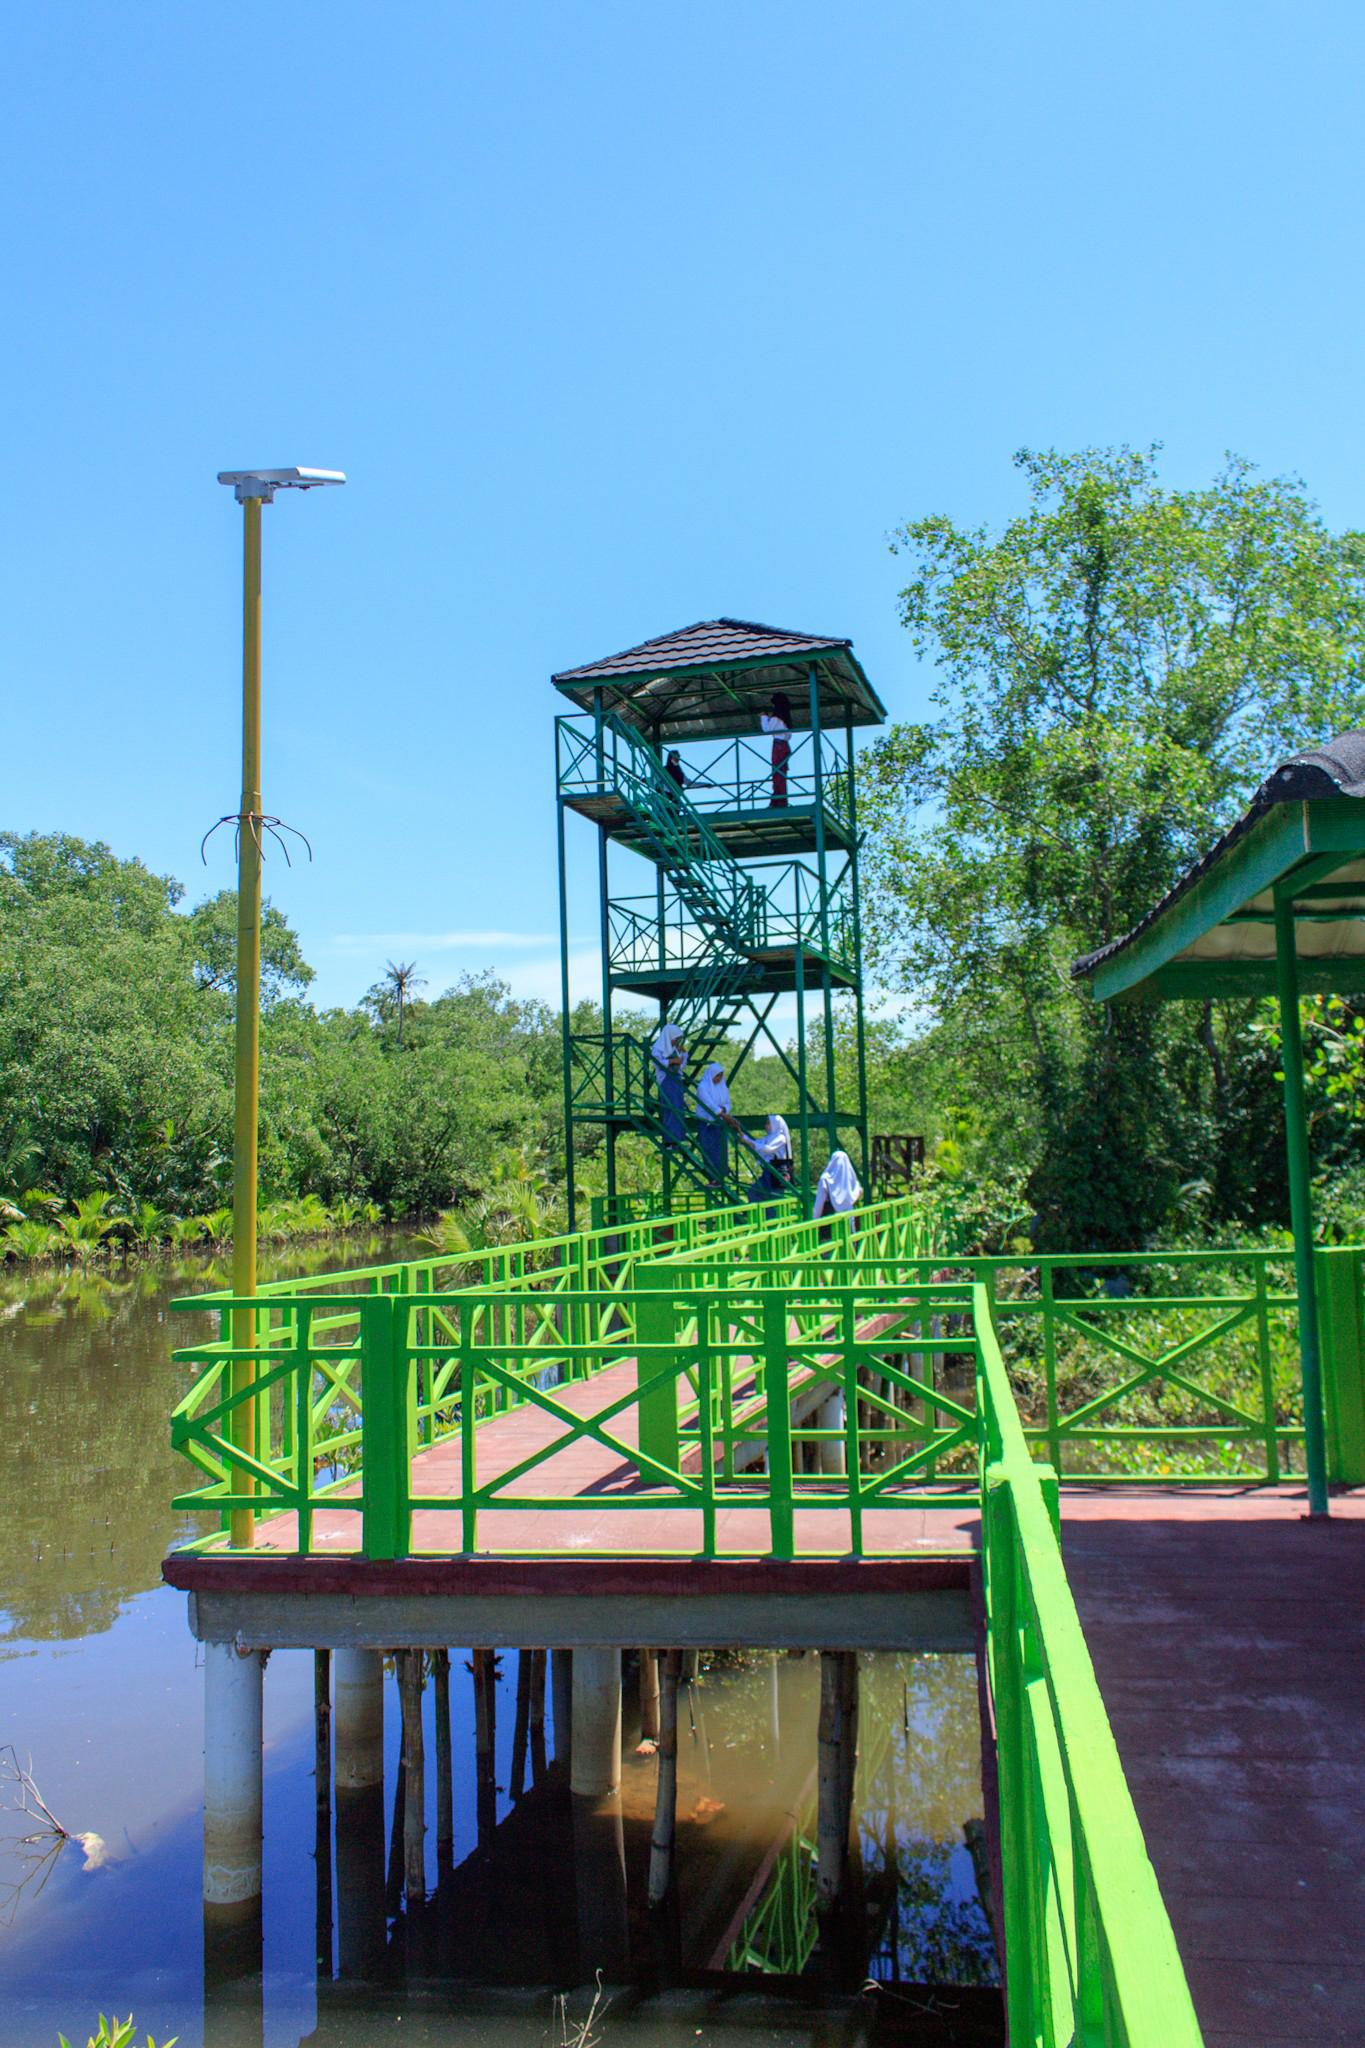 Wisata Edukasi Apar Pariaman Mangrove Park Banyak Yang Sudah Tak Sabar Untuk Datang Kesini Piaman Explore